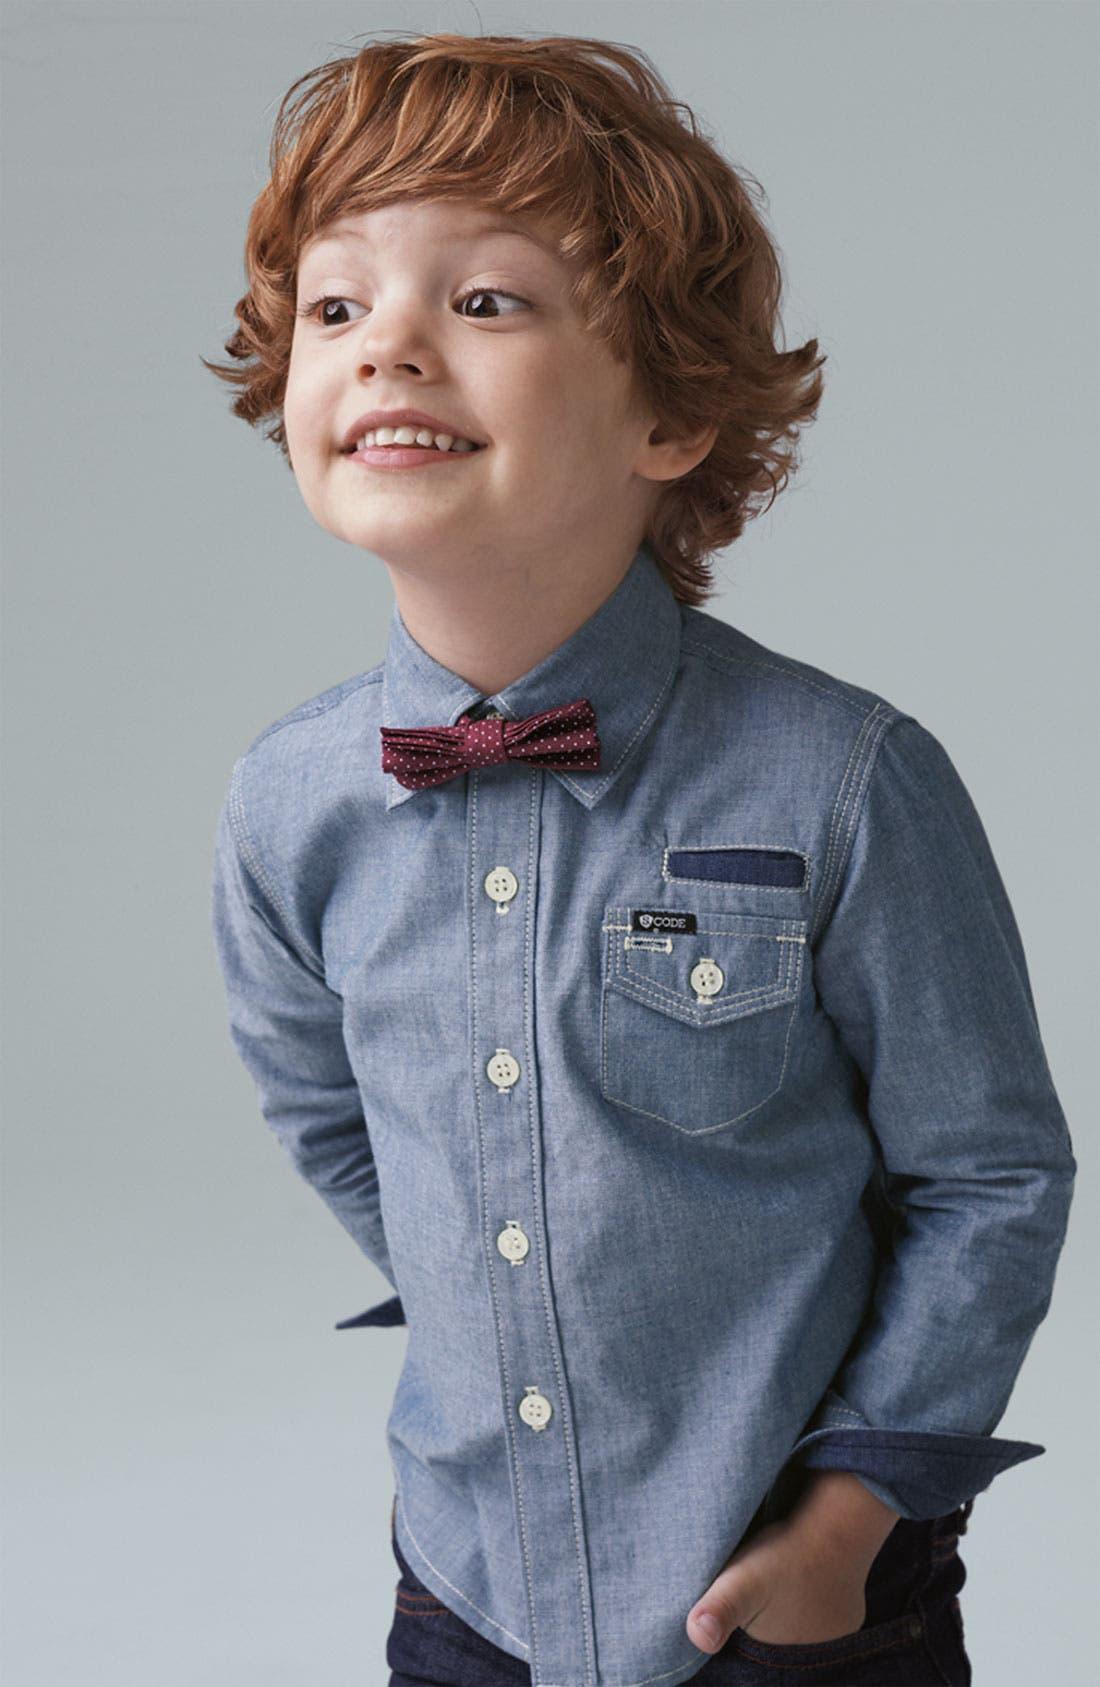 Main Image - Sovereign Code Shirt & Joe's Jeans (Toddler)